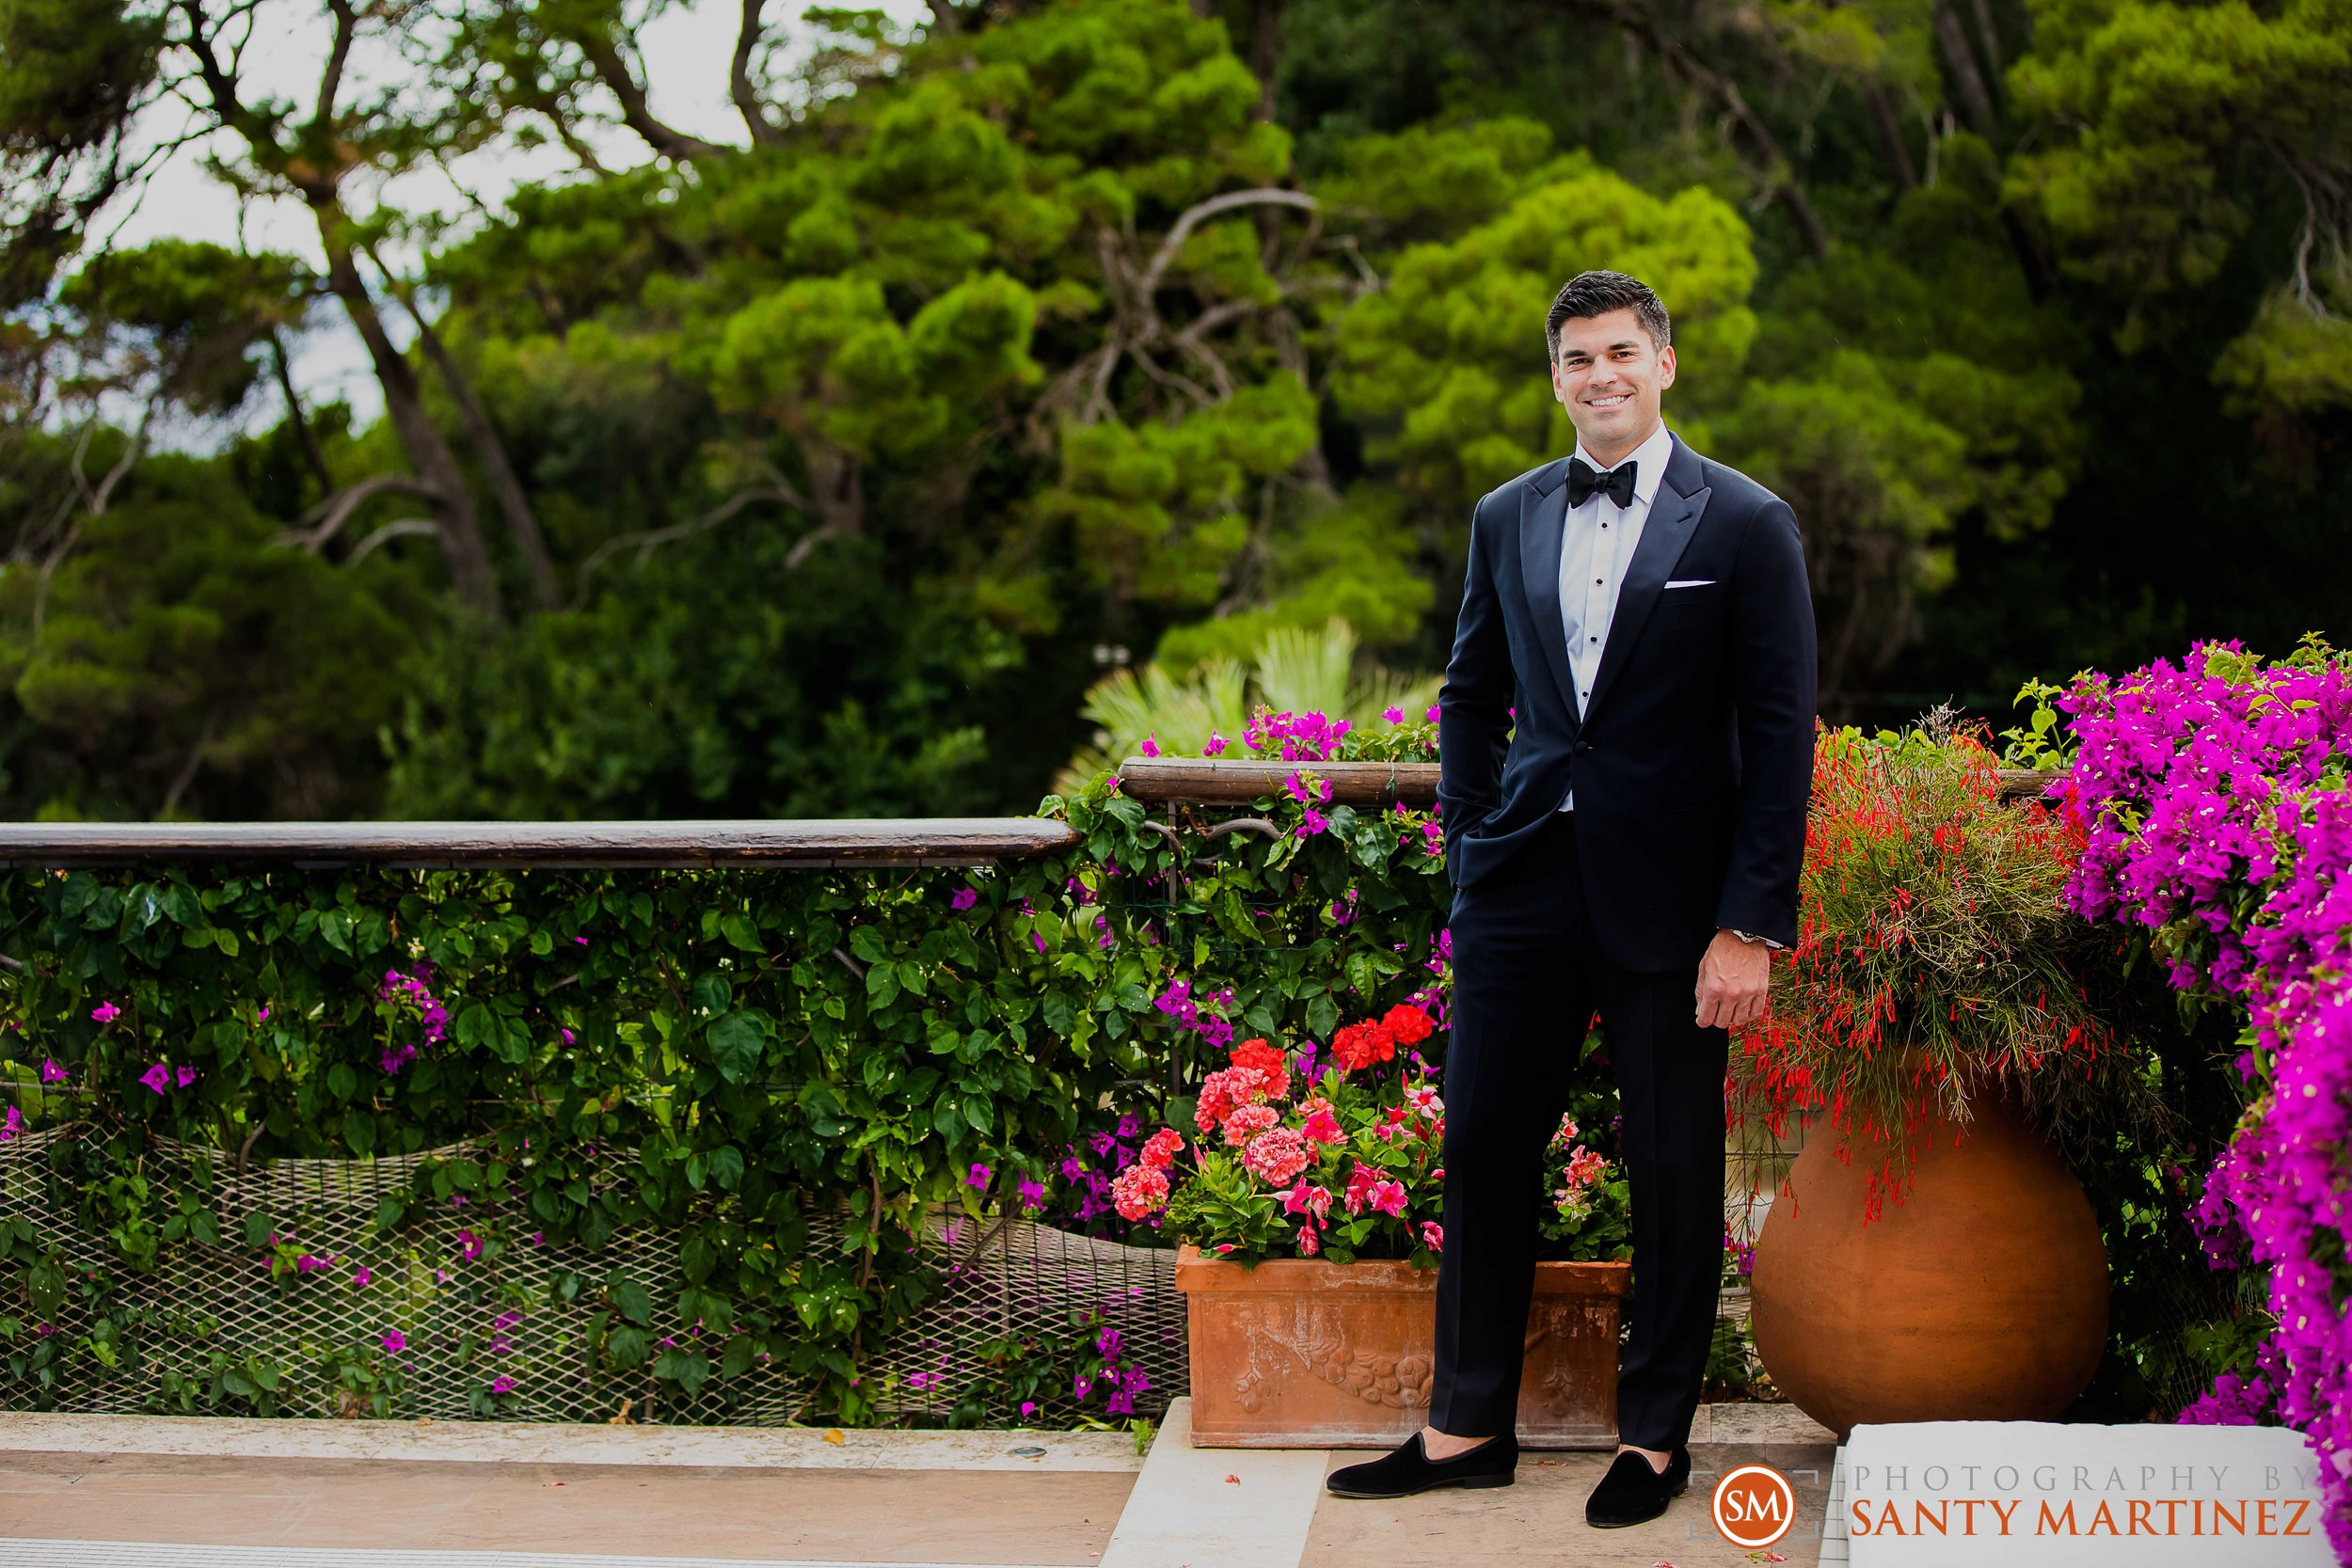 Wedding Capri Italy - Photography by Santy Martinez-17.jpg